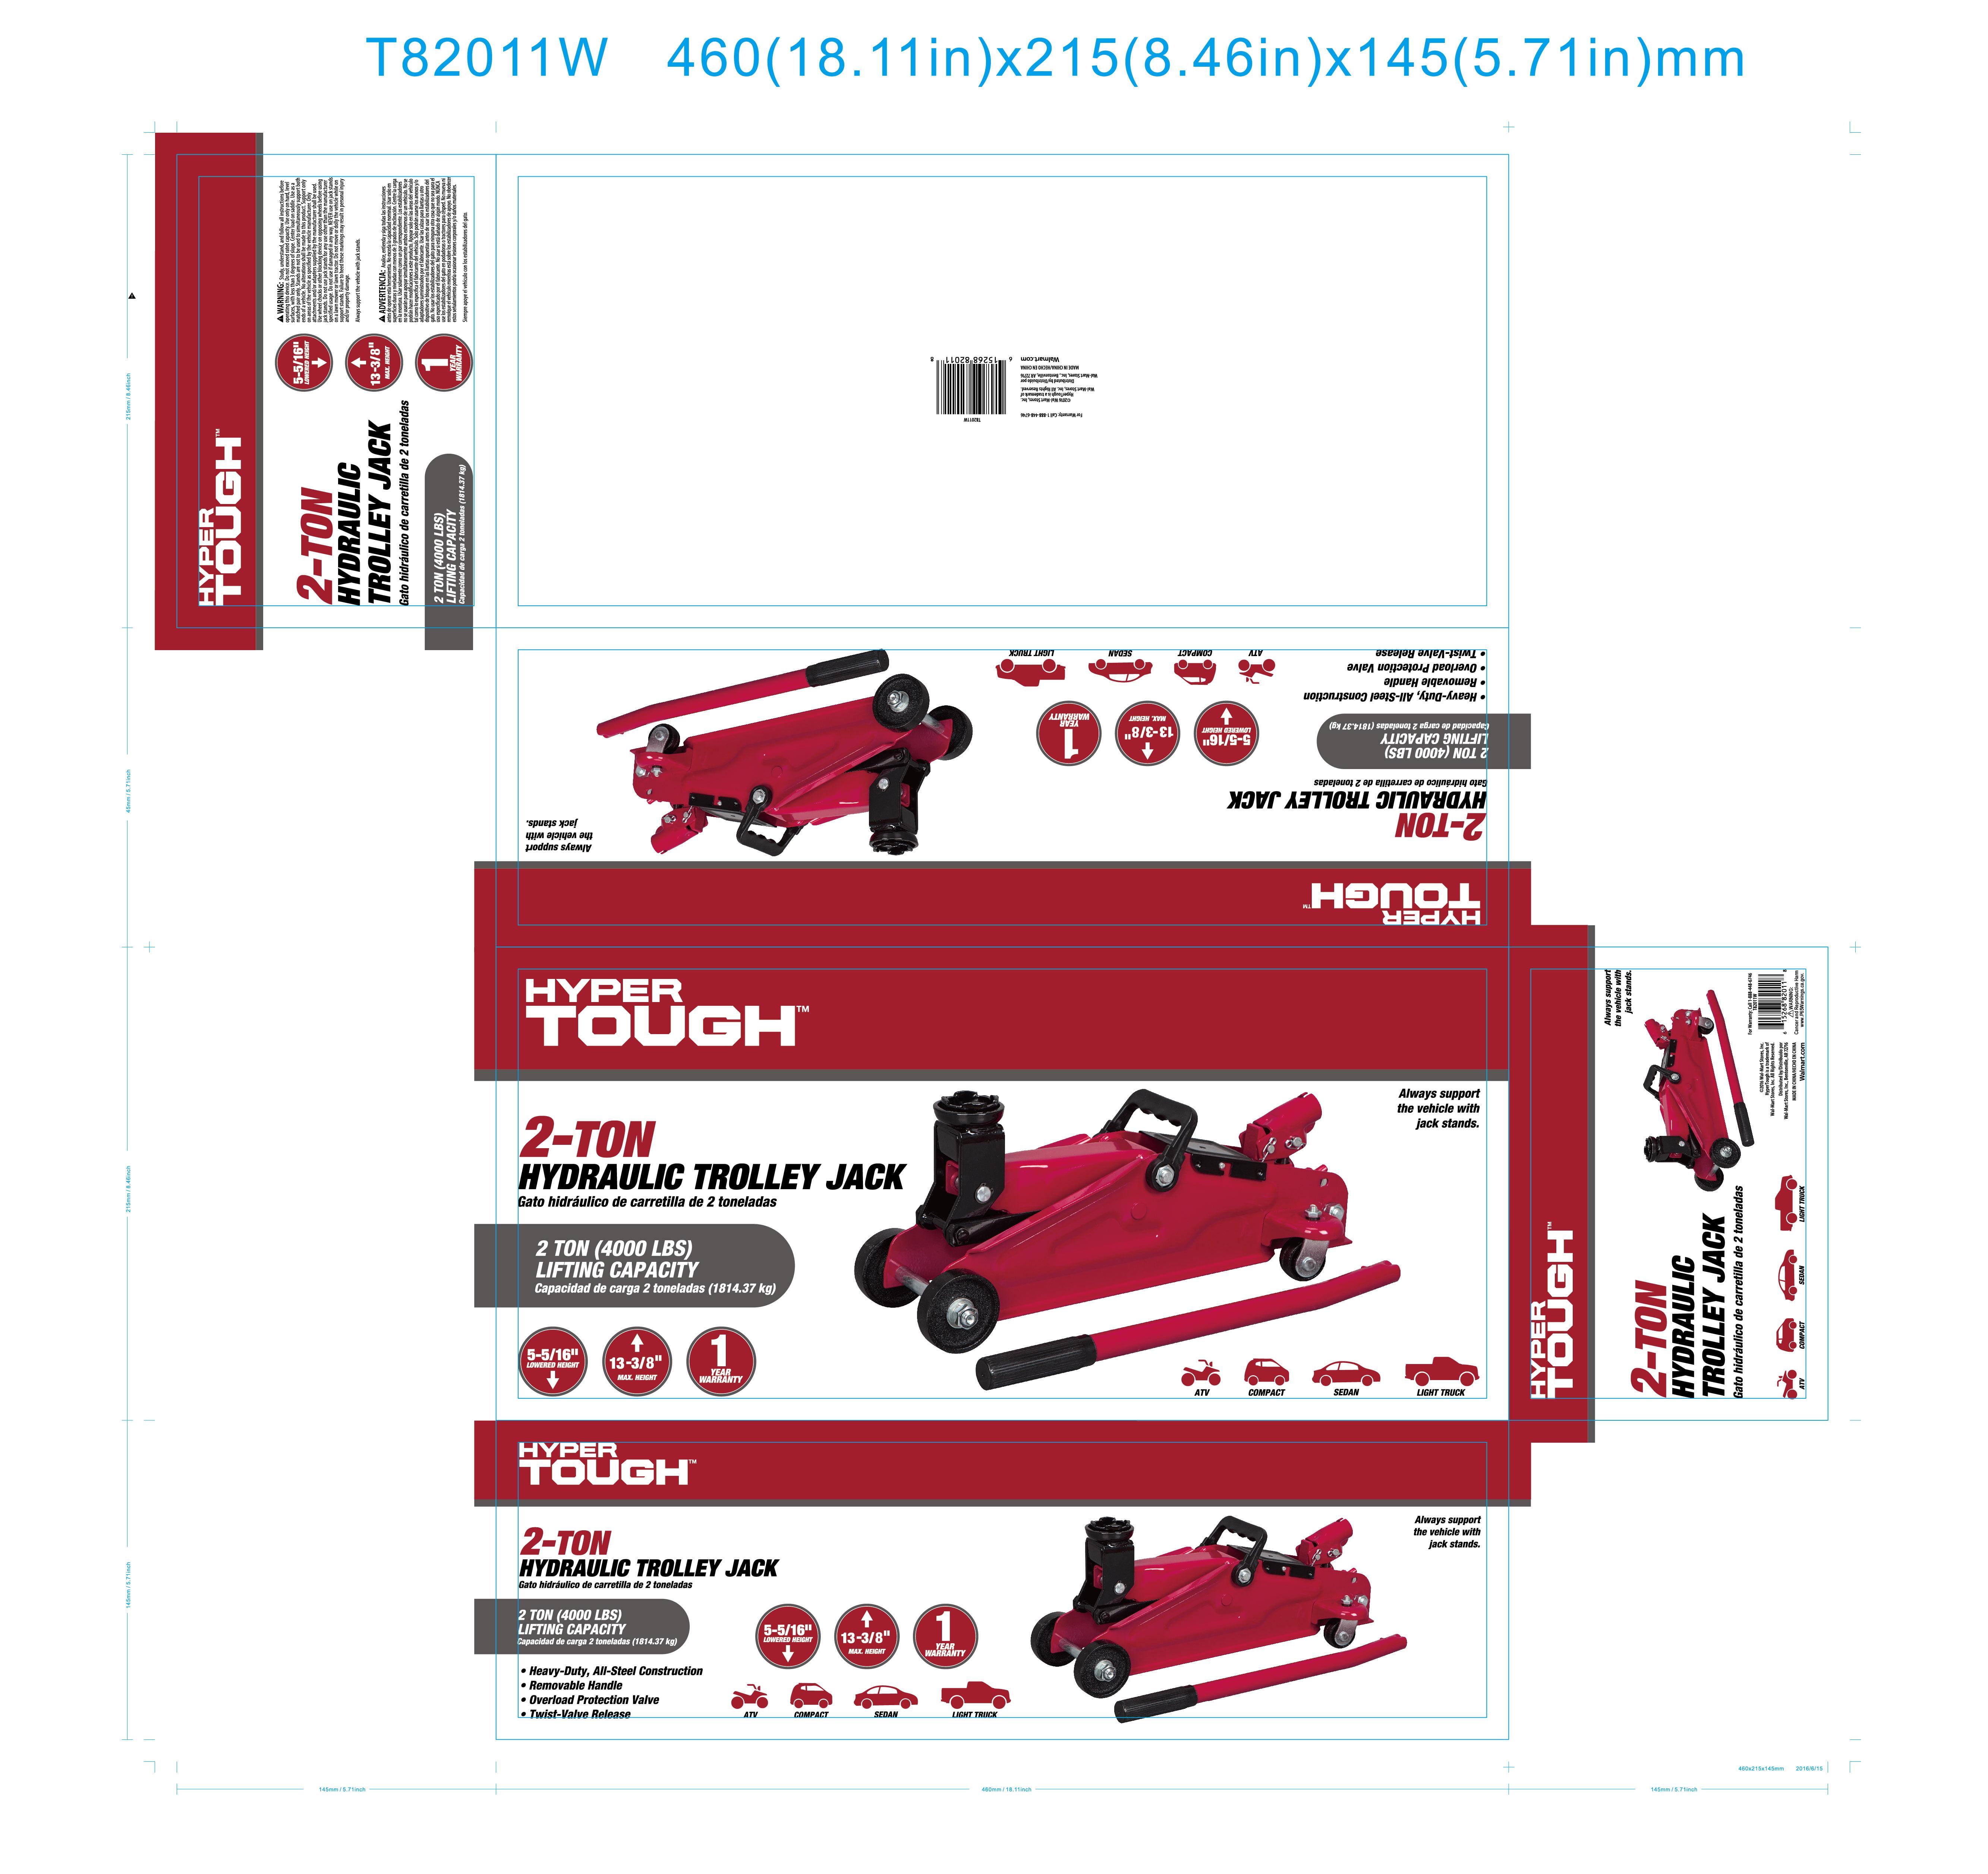 f2b5d5c9de HyperTough 2-Ton Hydraulic Trolley Jack - Walmart.com